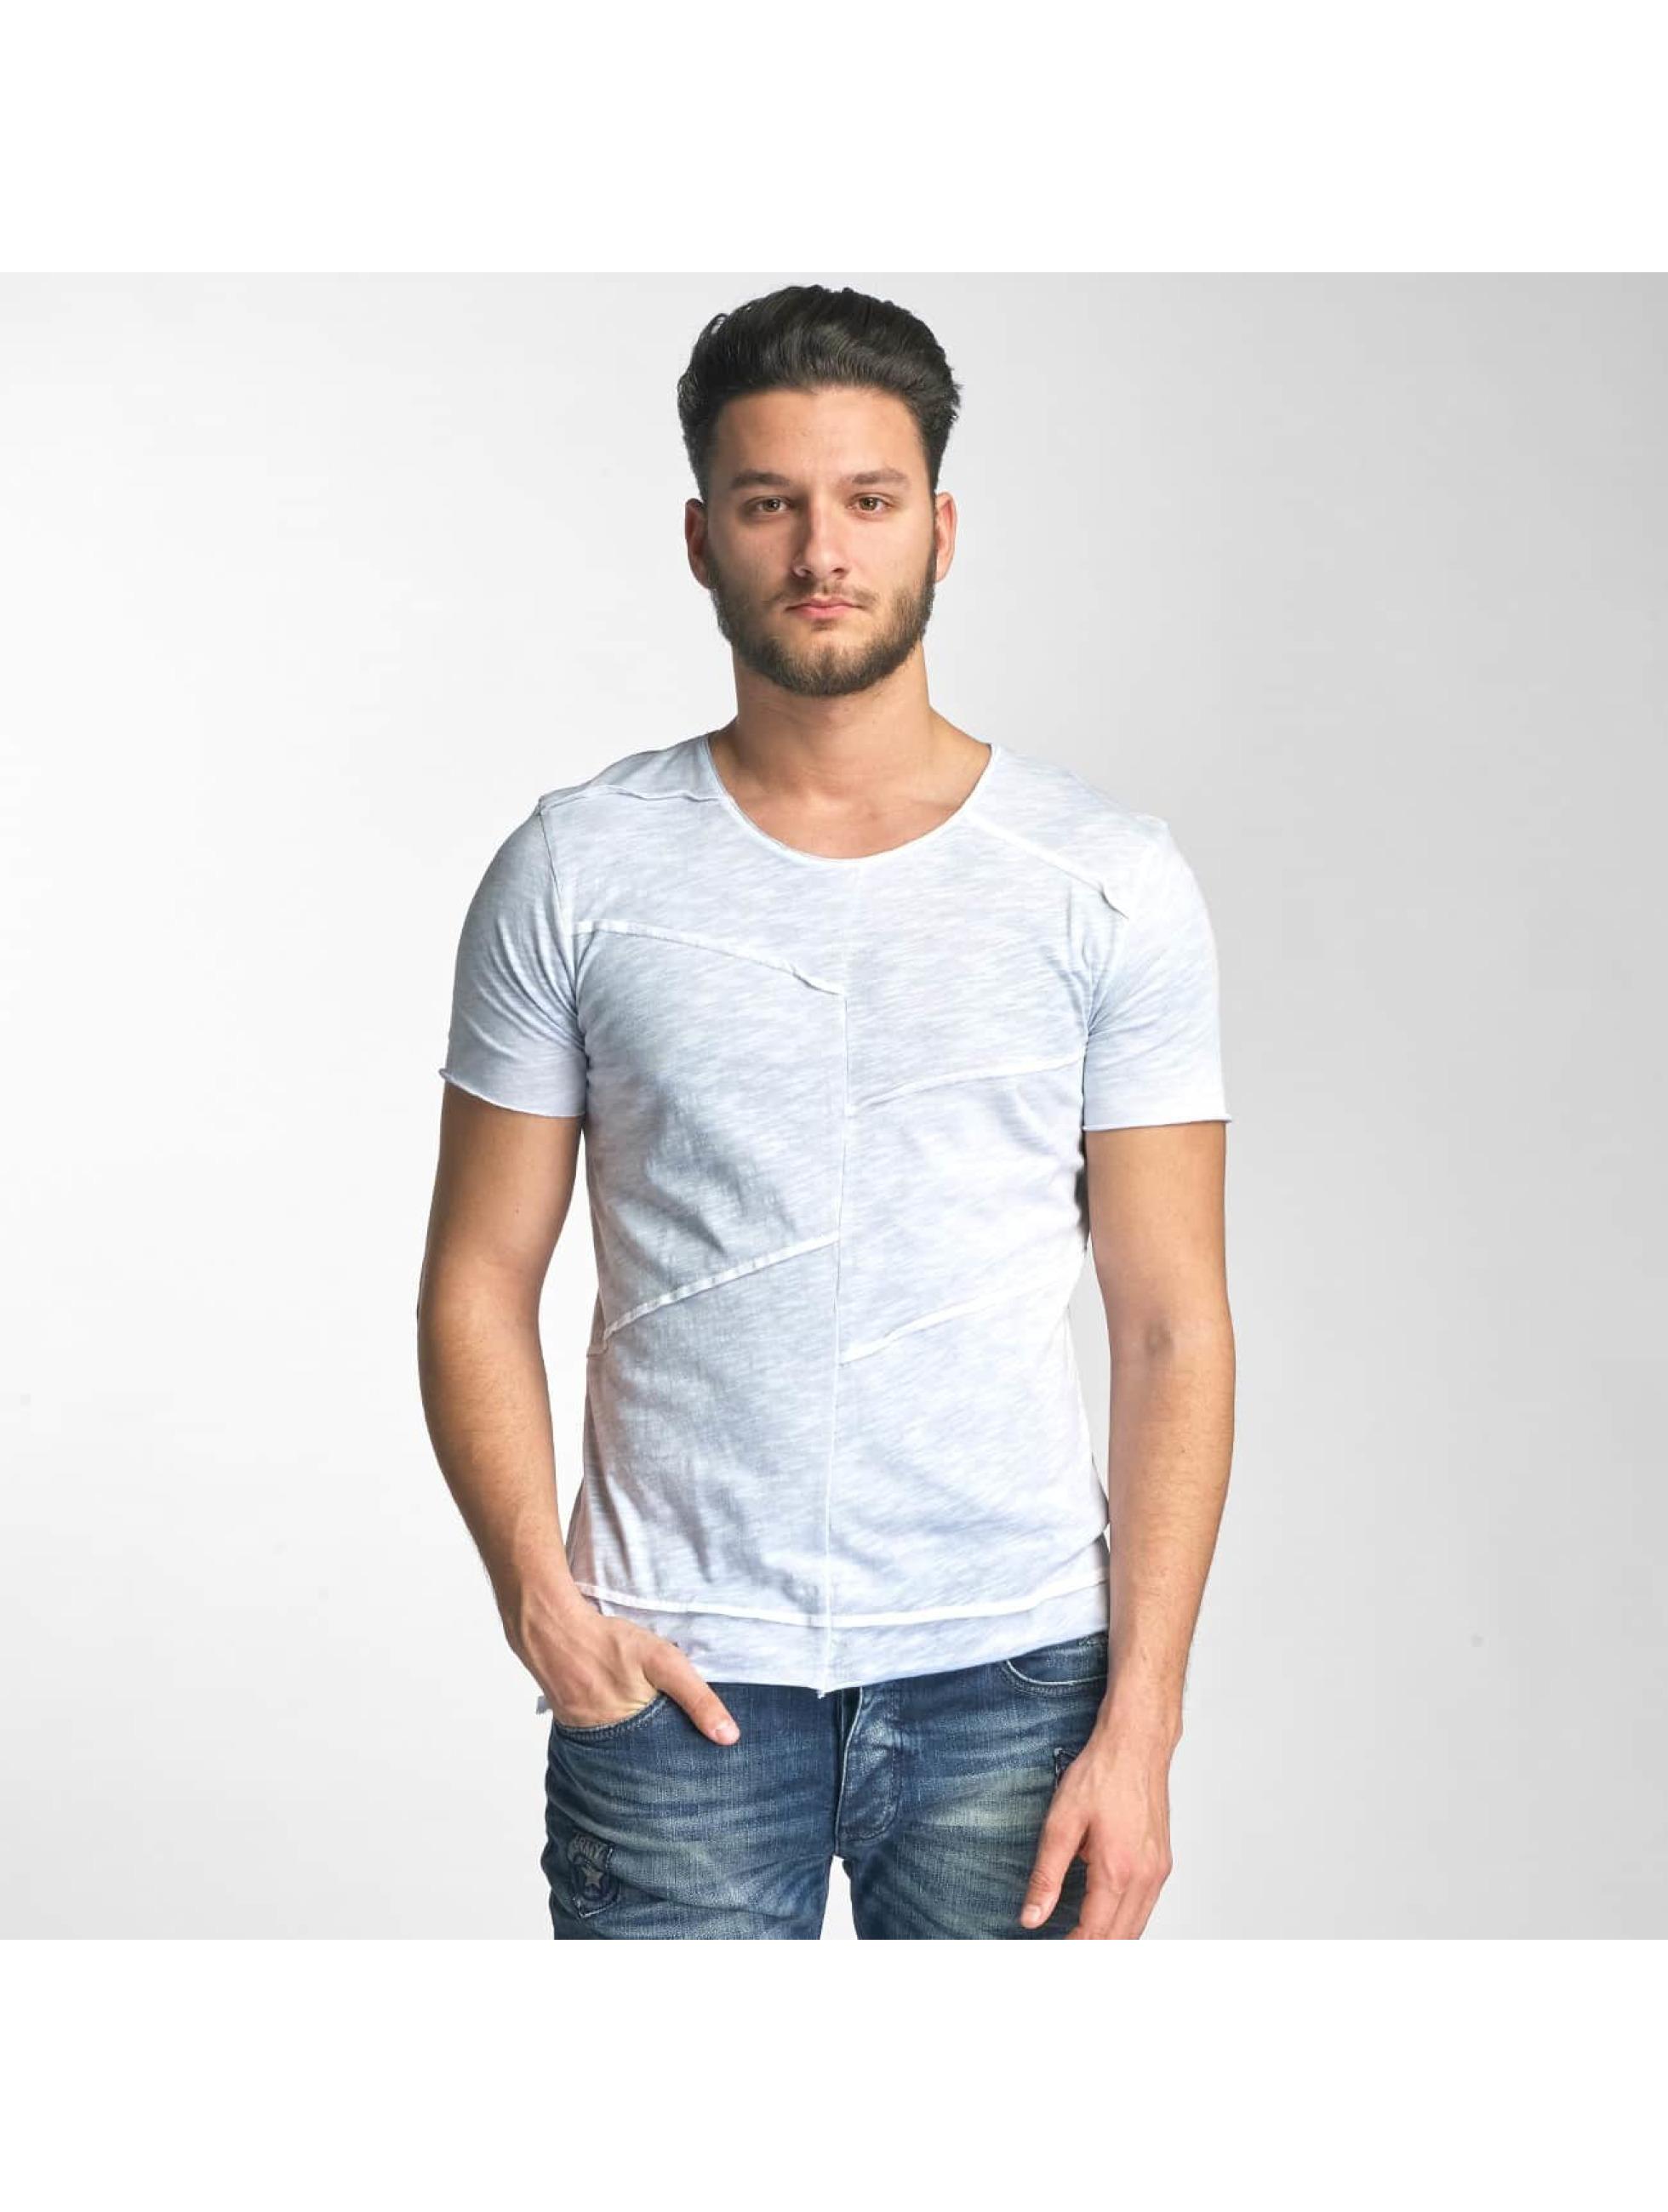 Red-Bridge-Uomini-Maglieria-T-shirt-Vintage-Patchwork